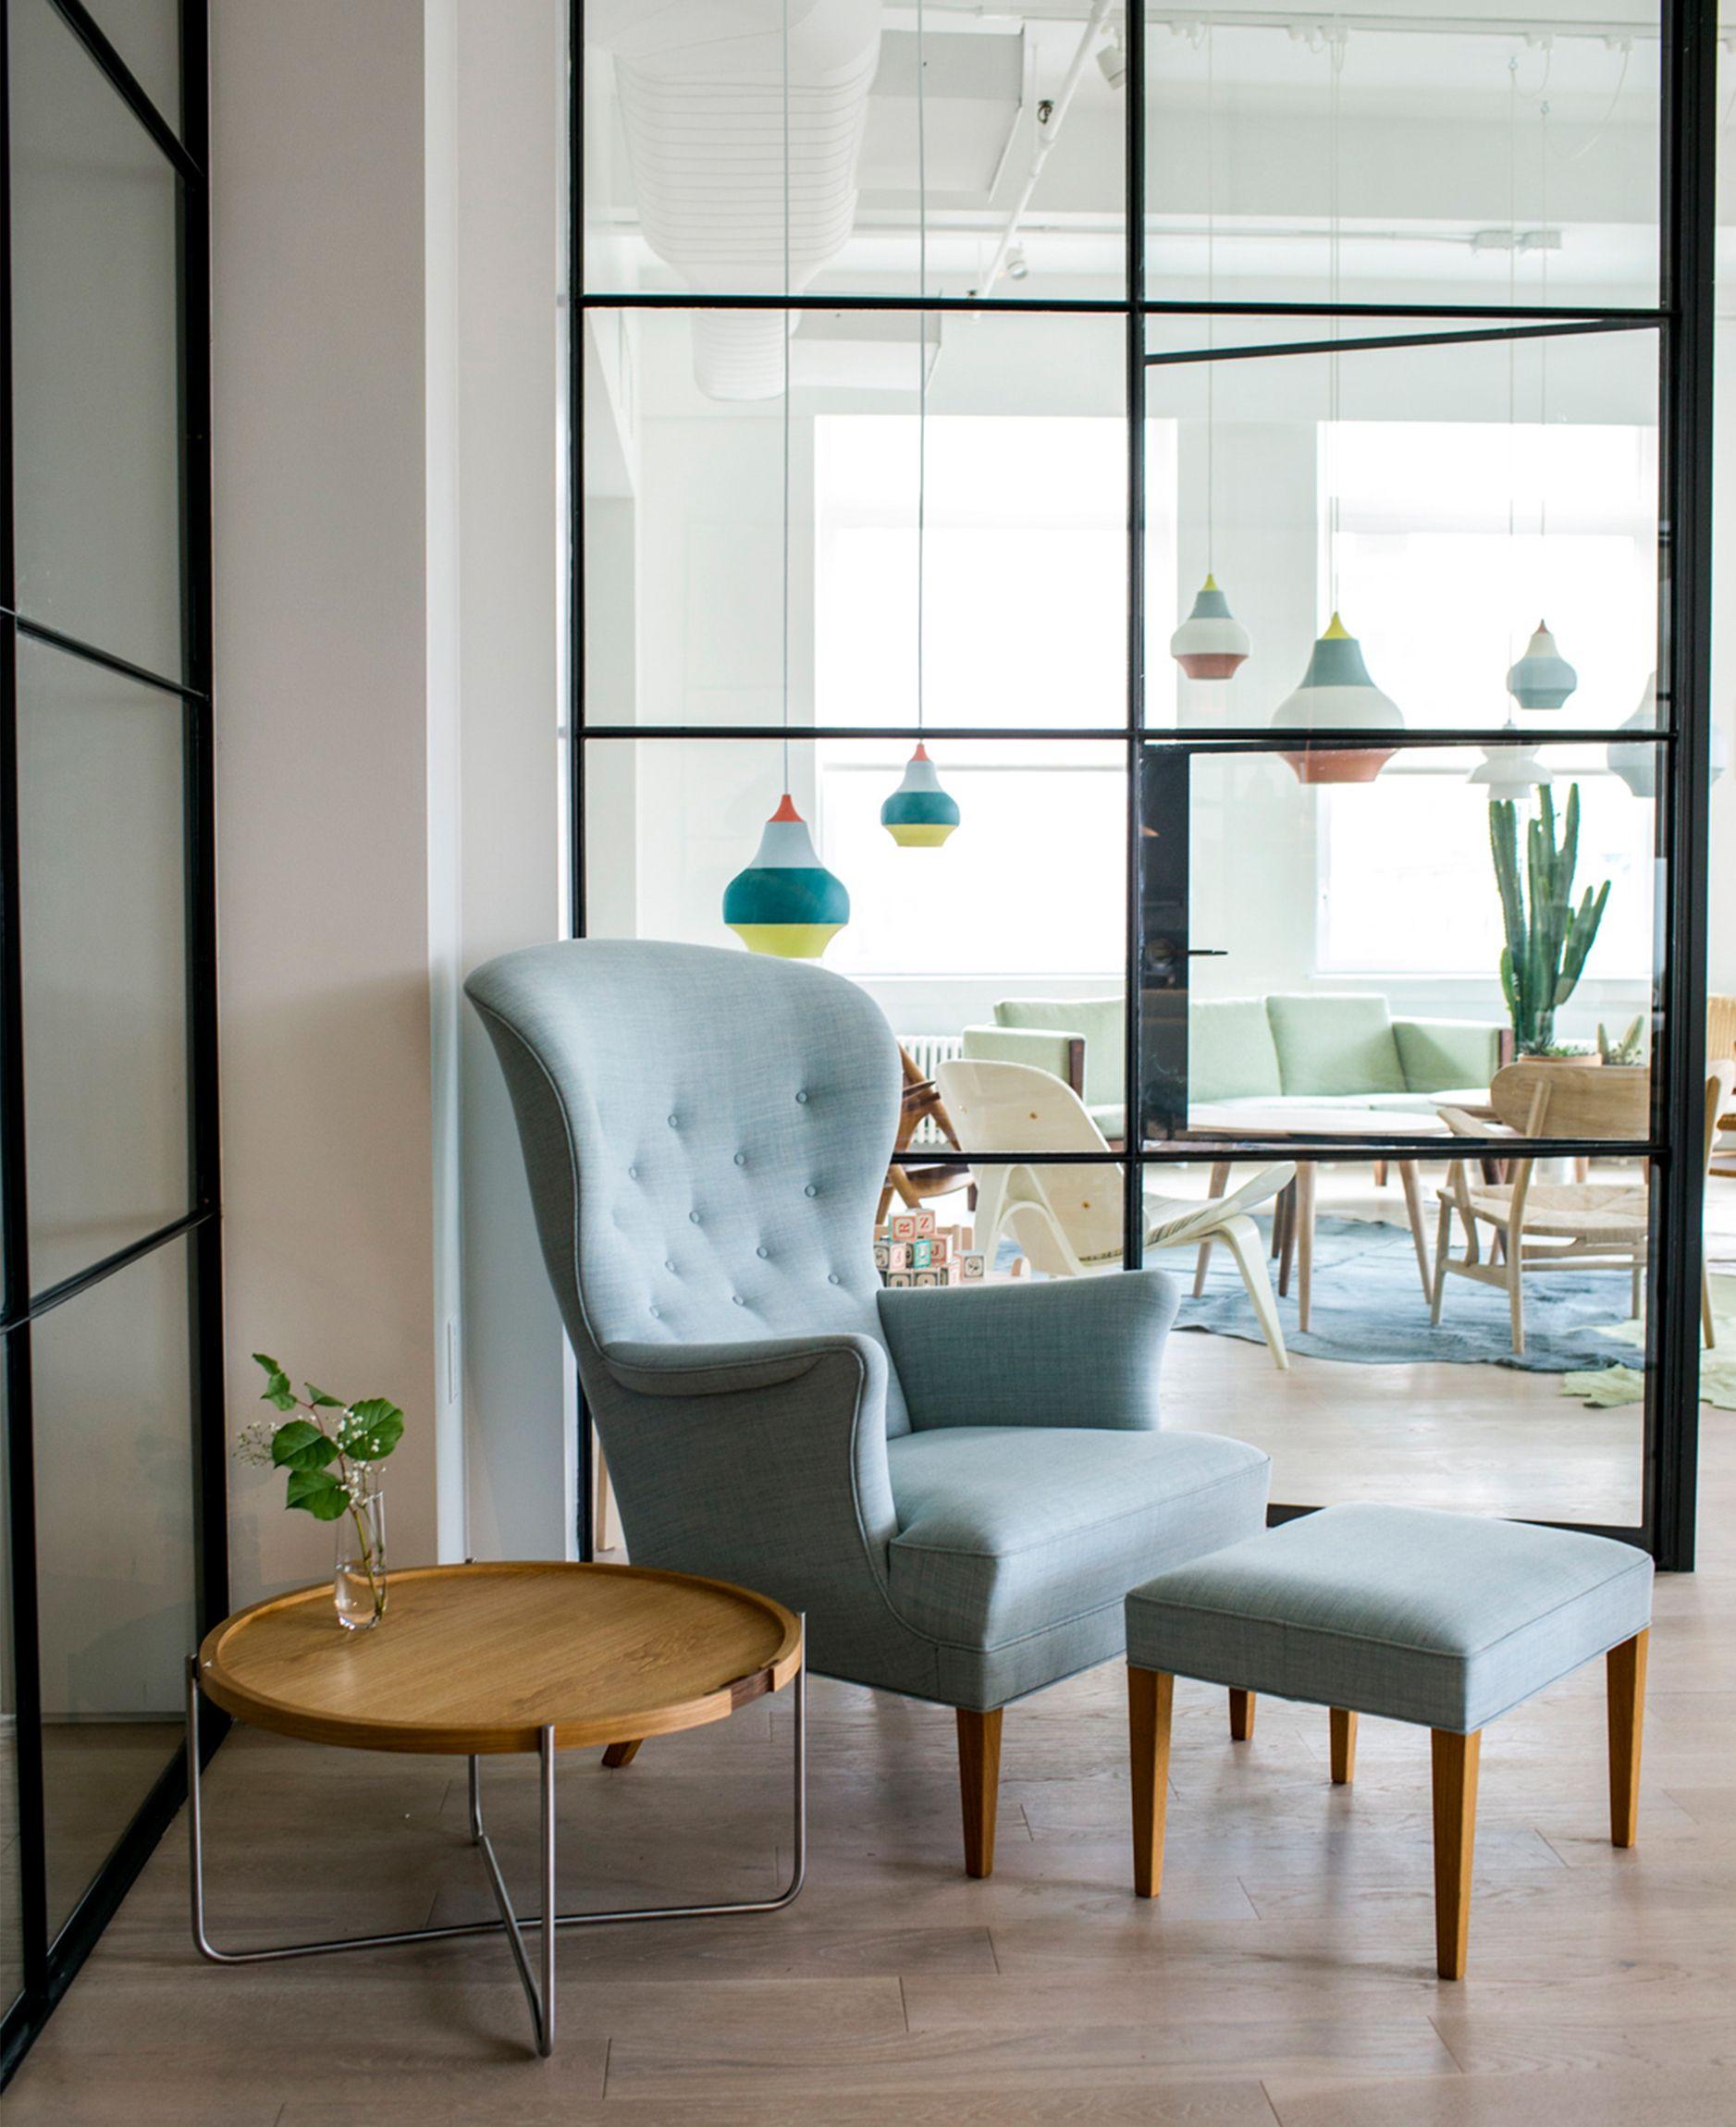 new danish furniture. A Photographic Tour Of The New Carl Hansen NYC Showroom In Flatiron. Danish FurnitureModern Furniture